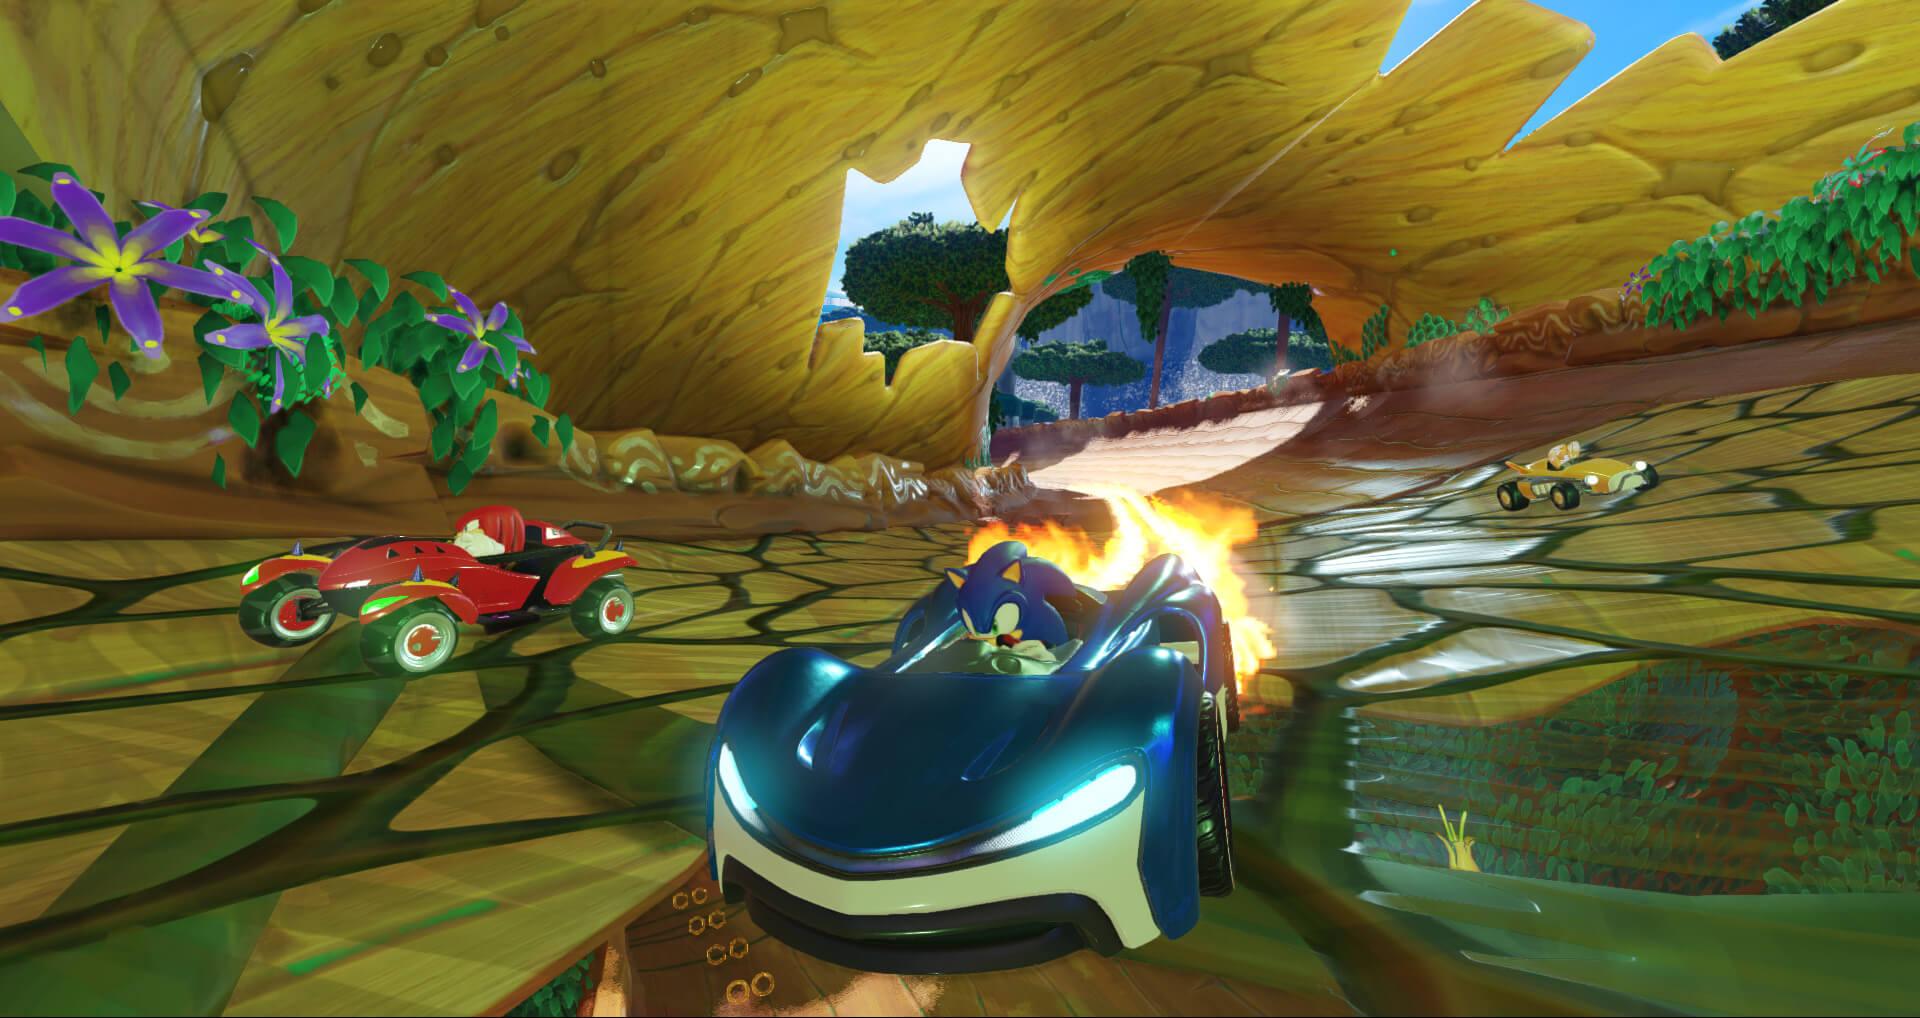 https://www.dsogaming.com/wp-content/uploads/2018/05/Team-Sonic-Racing-3.jpg